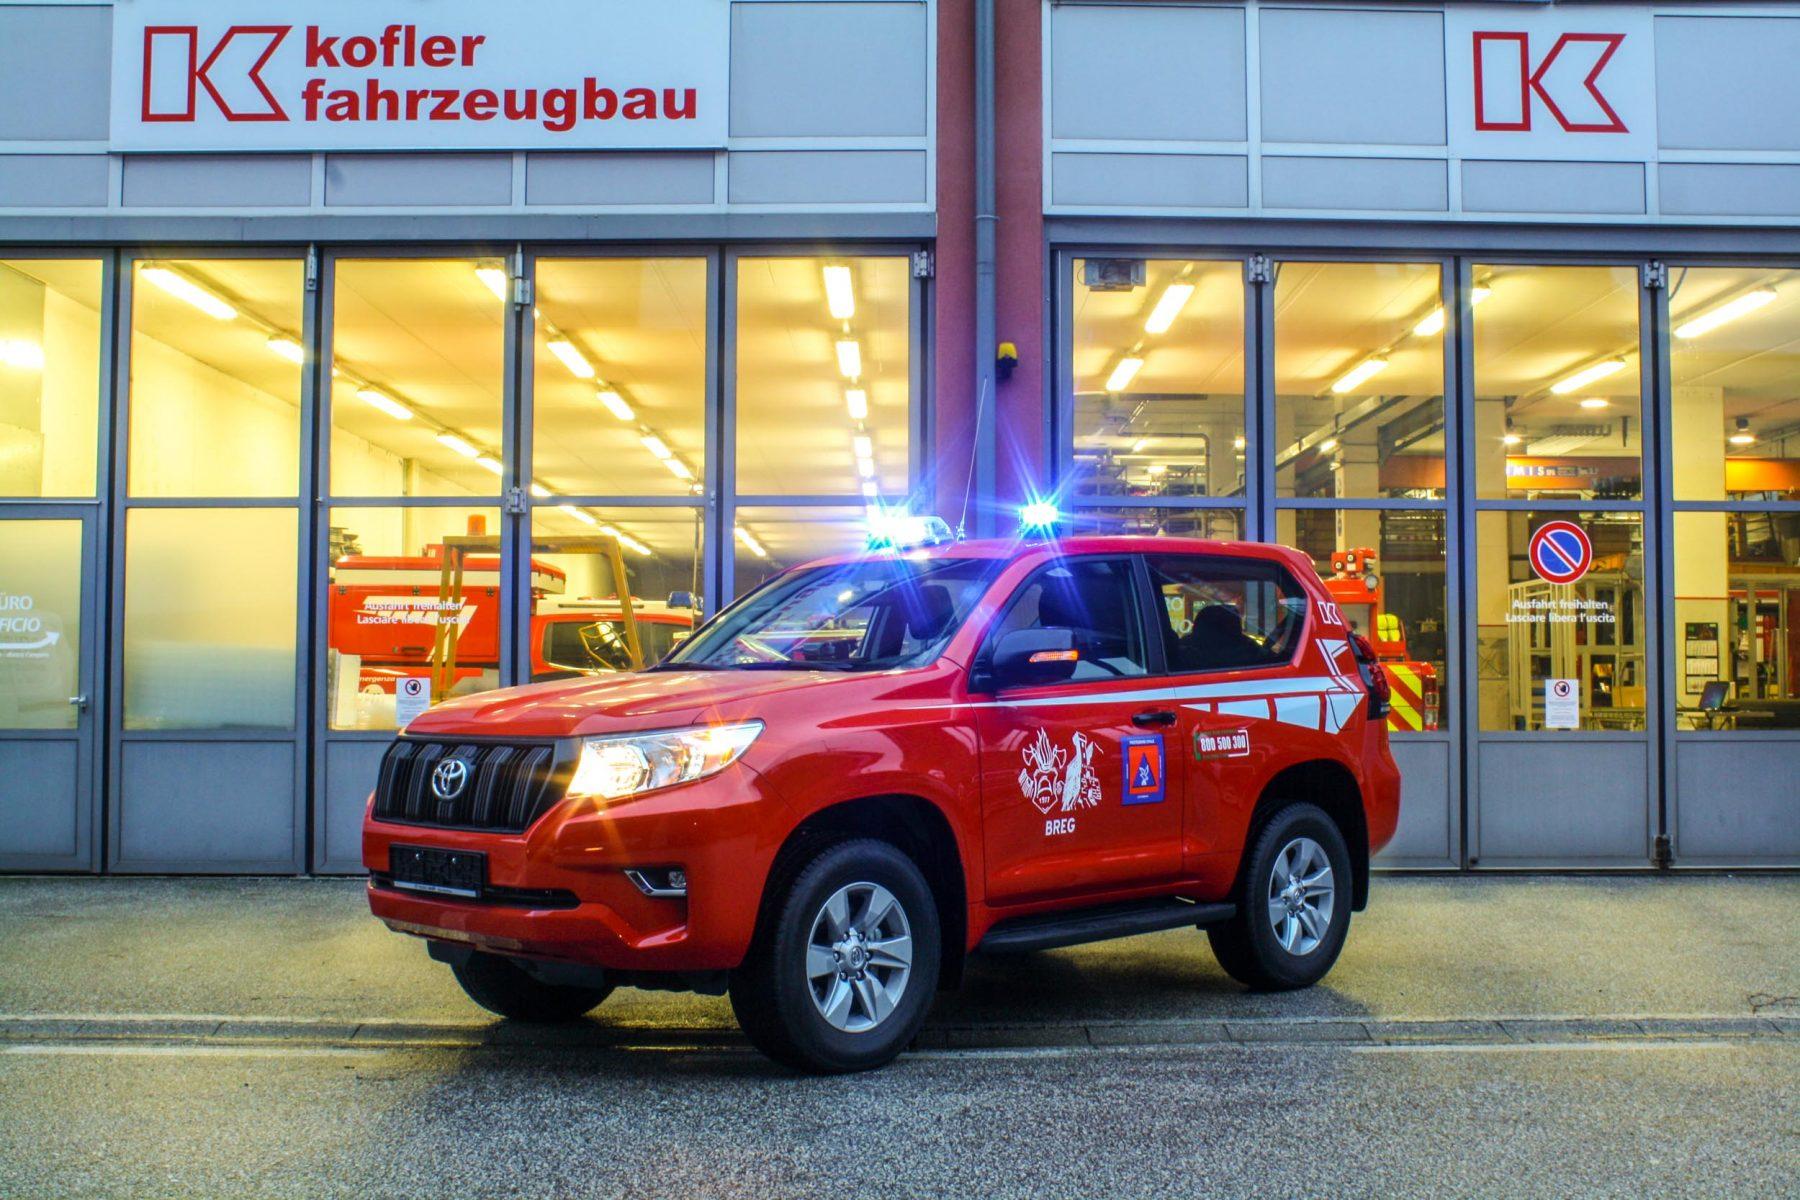 Kofler-Fahrzeugbau-VVF-Breg